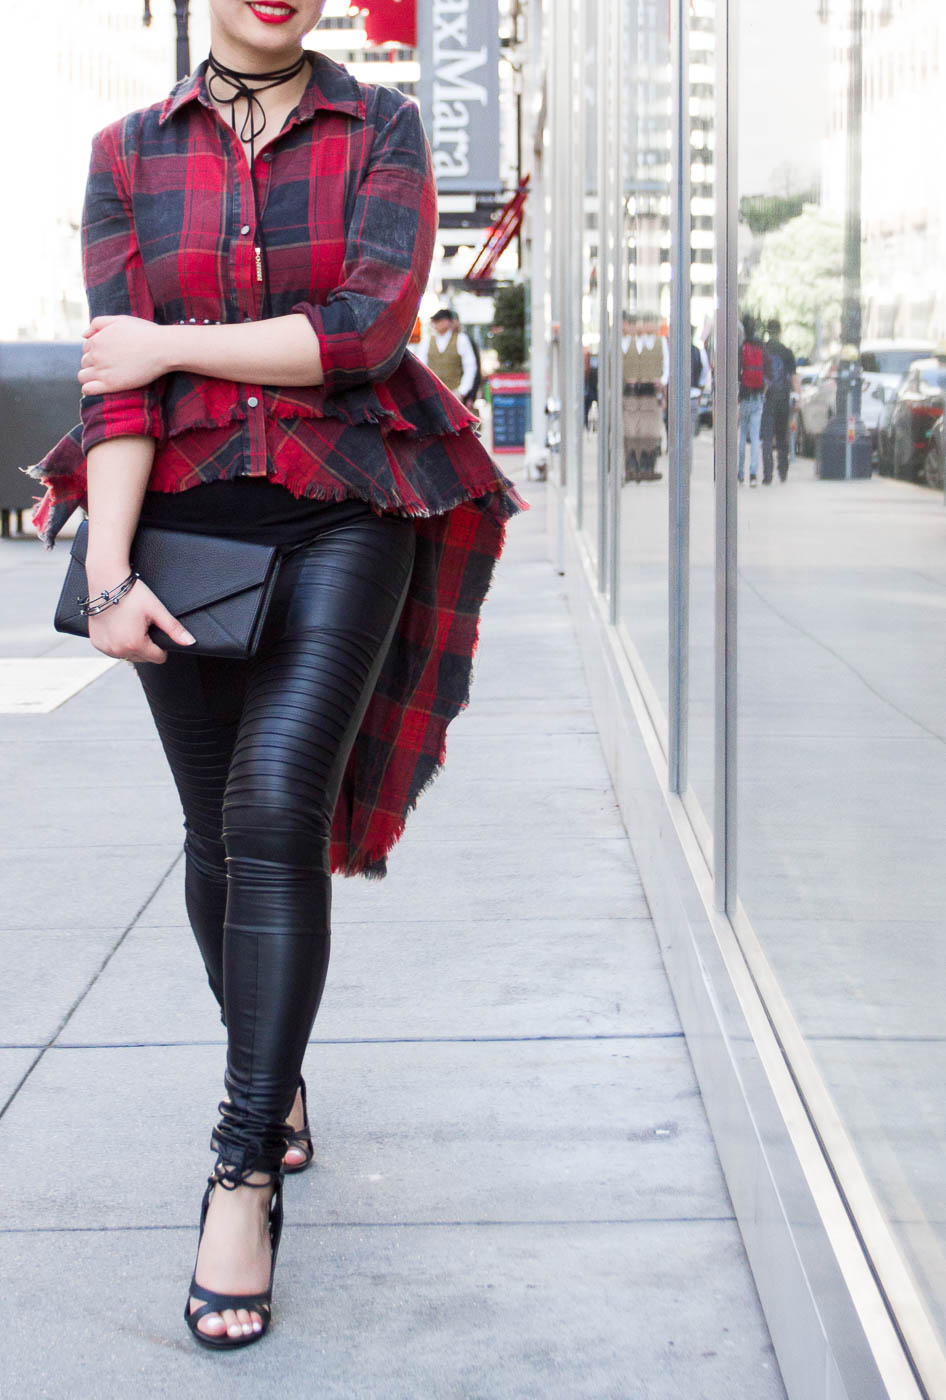 Zara Plaid Shirt, Cuyana Envelope Clutch, & Plush Moto Leggings | The Chic Diary